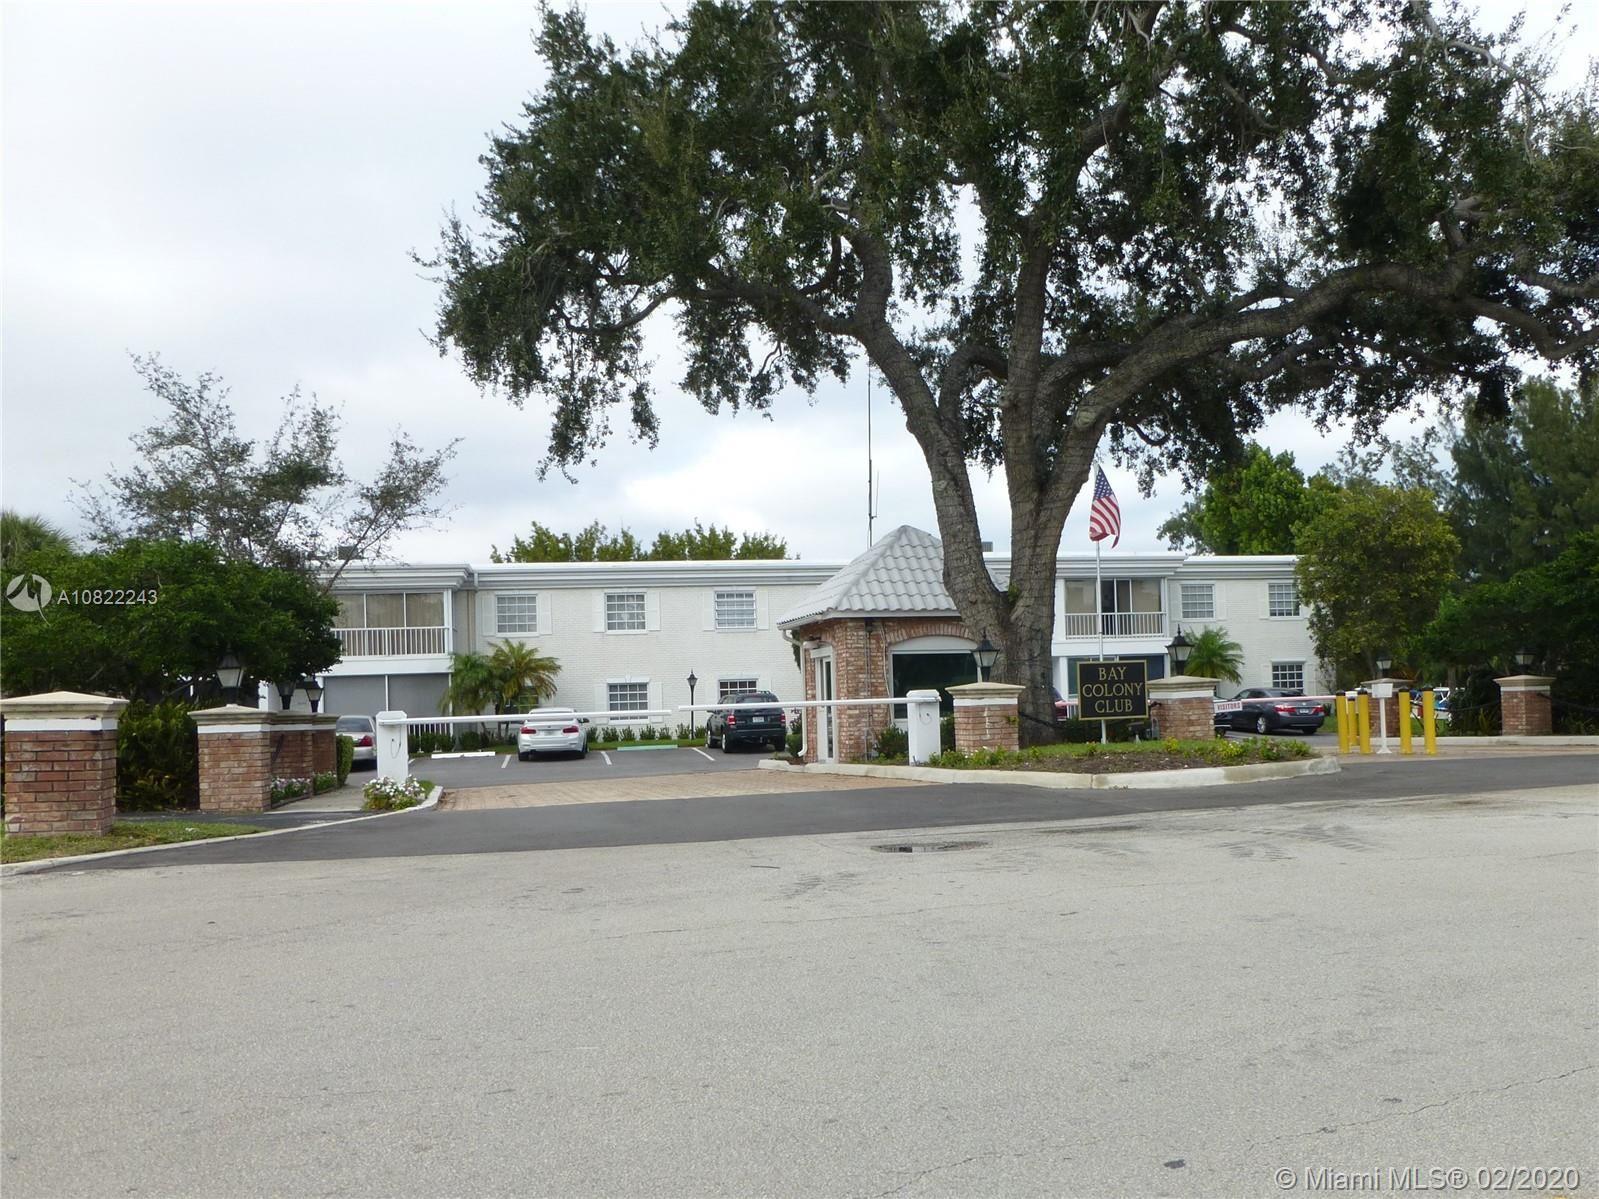 6275 Bay Club Dr #4, Fort Lauderdale, FL 33308 - #: A10822243